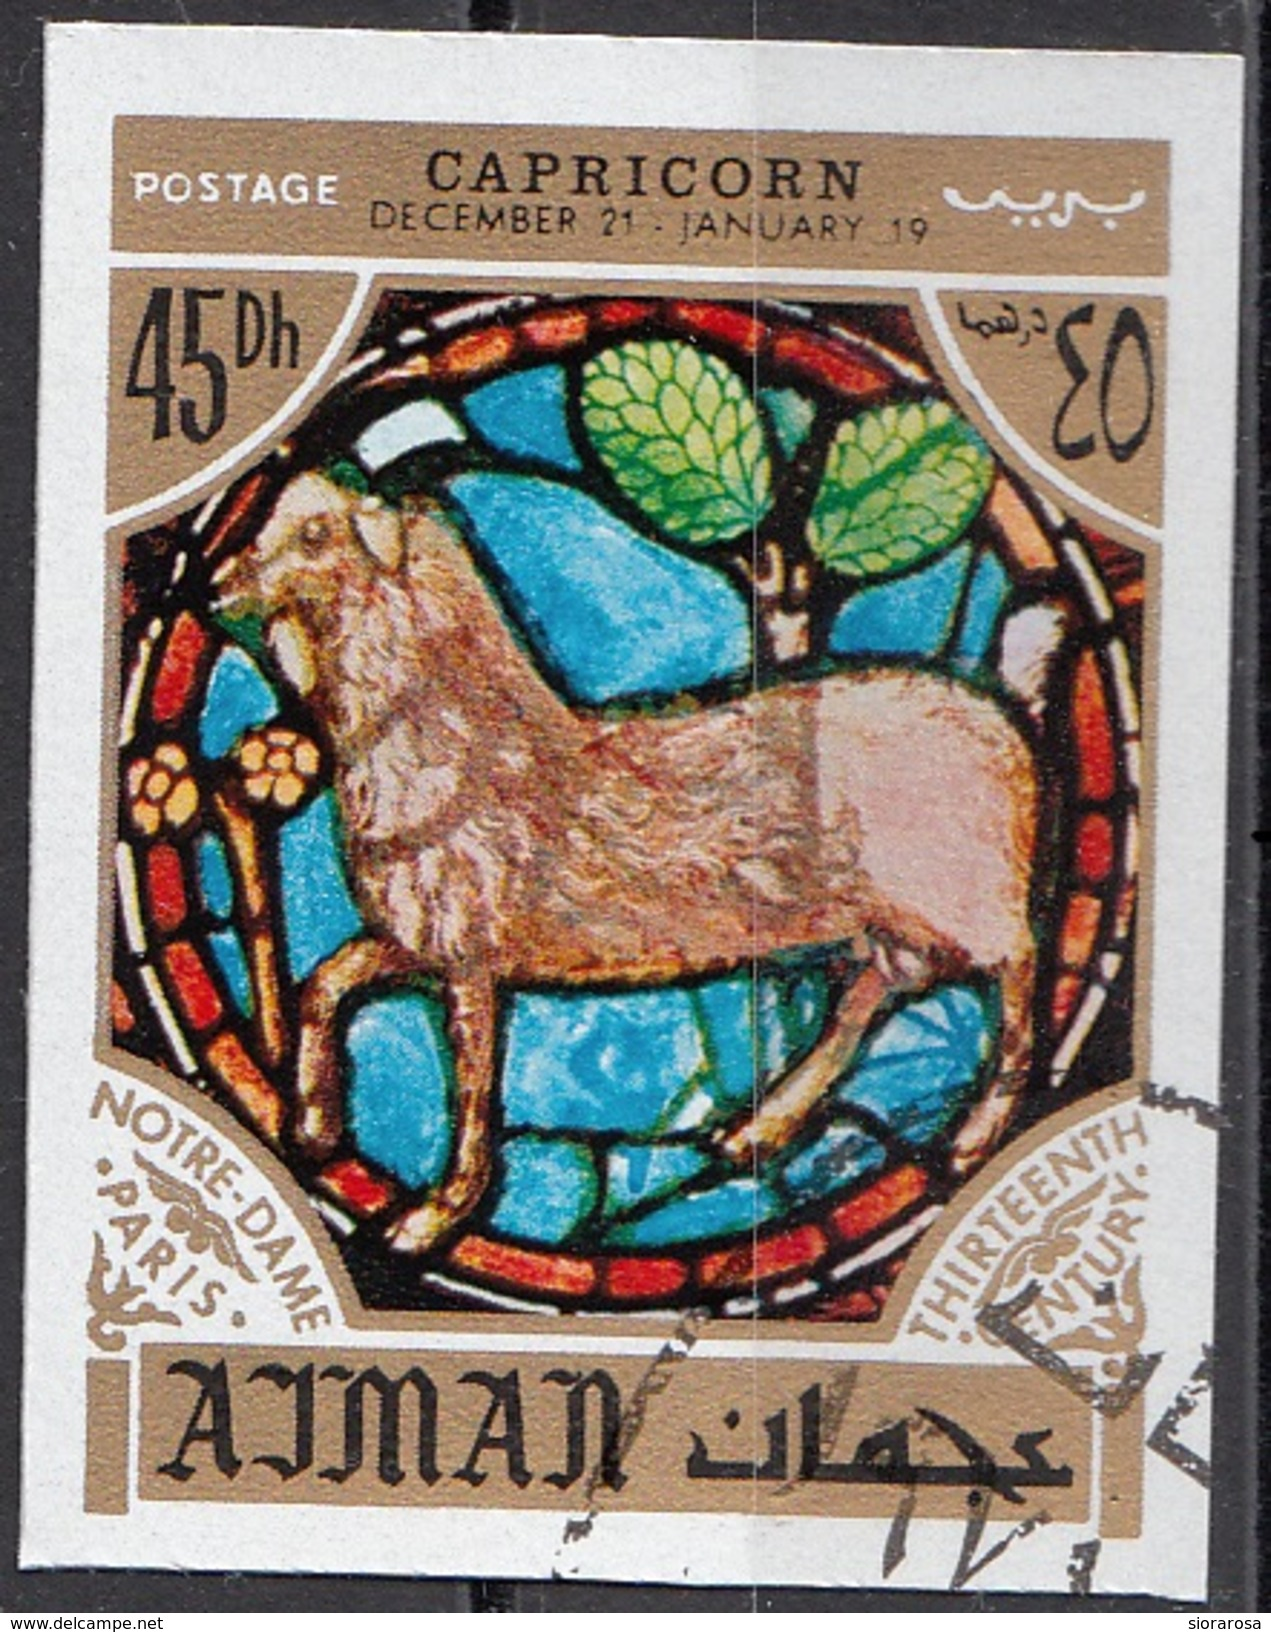 778 Ajman 1971 Segni Zodiaco Capricorno Capricorn - Stained Glass Window Vetrata Notre Dame Imperf. Zodiac - Vetri & Vetrate